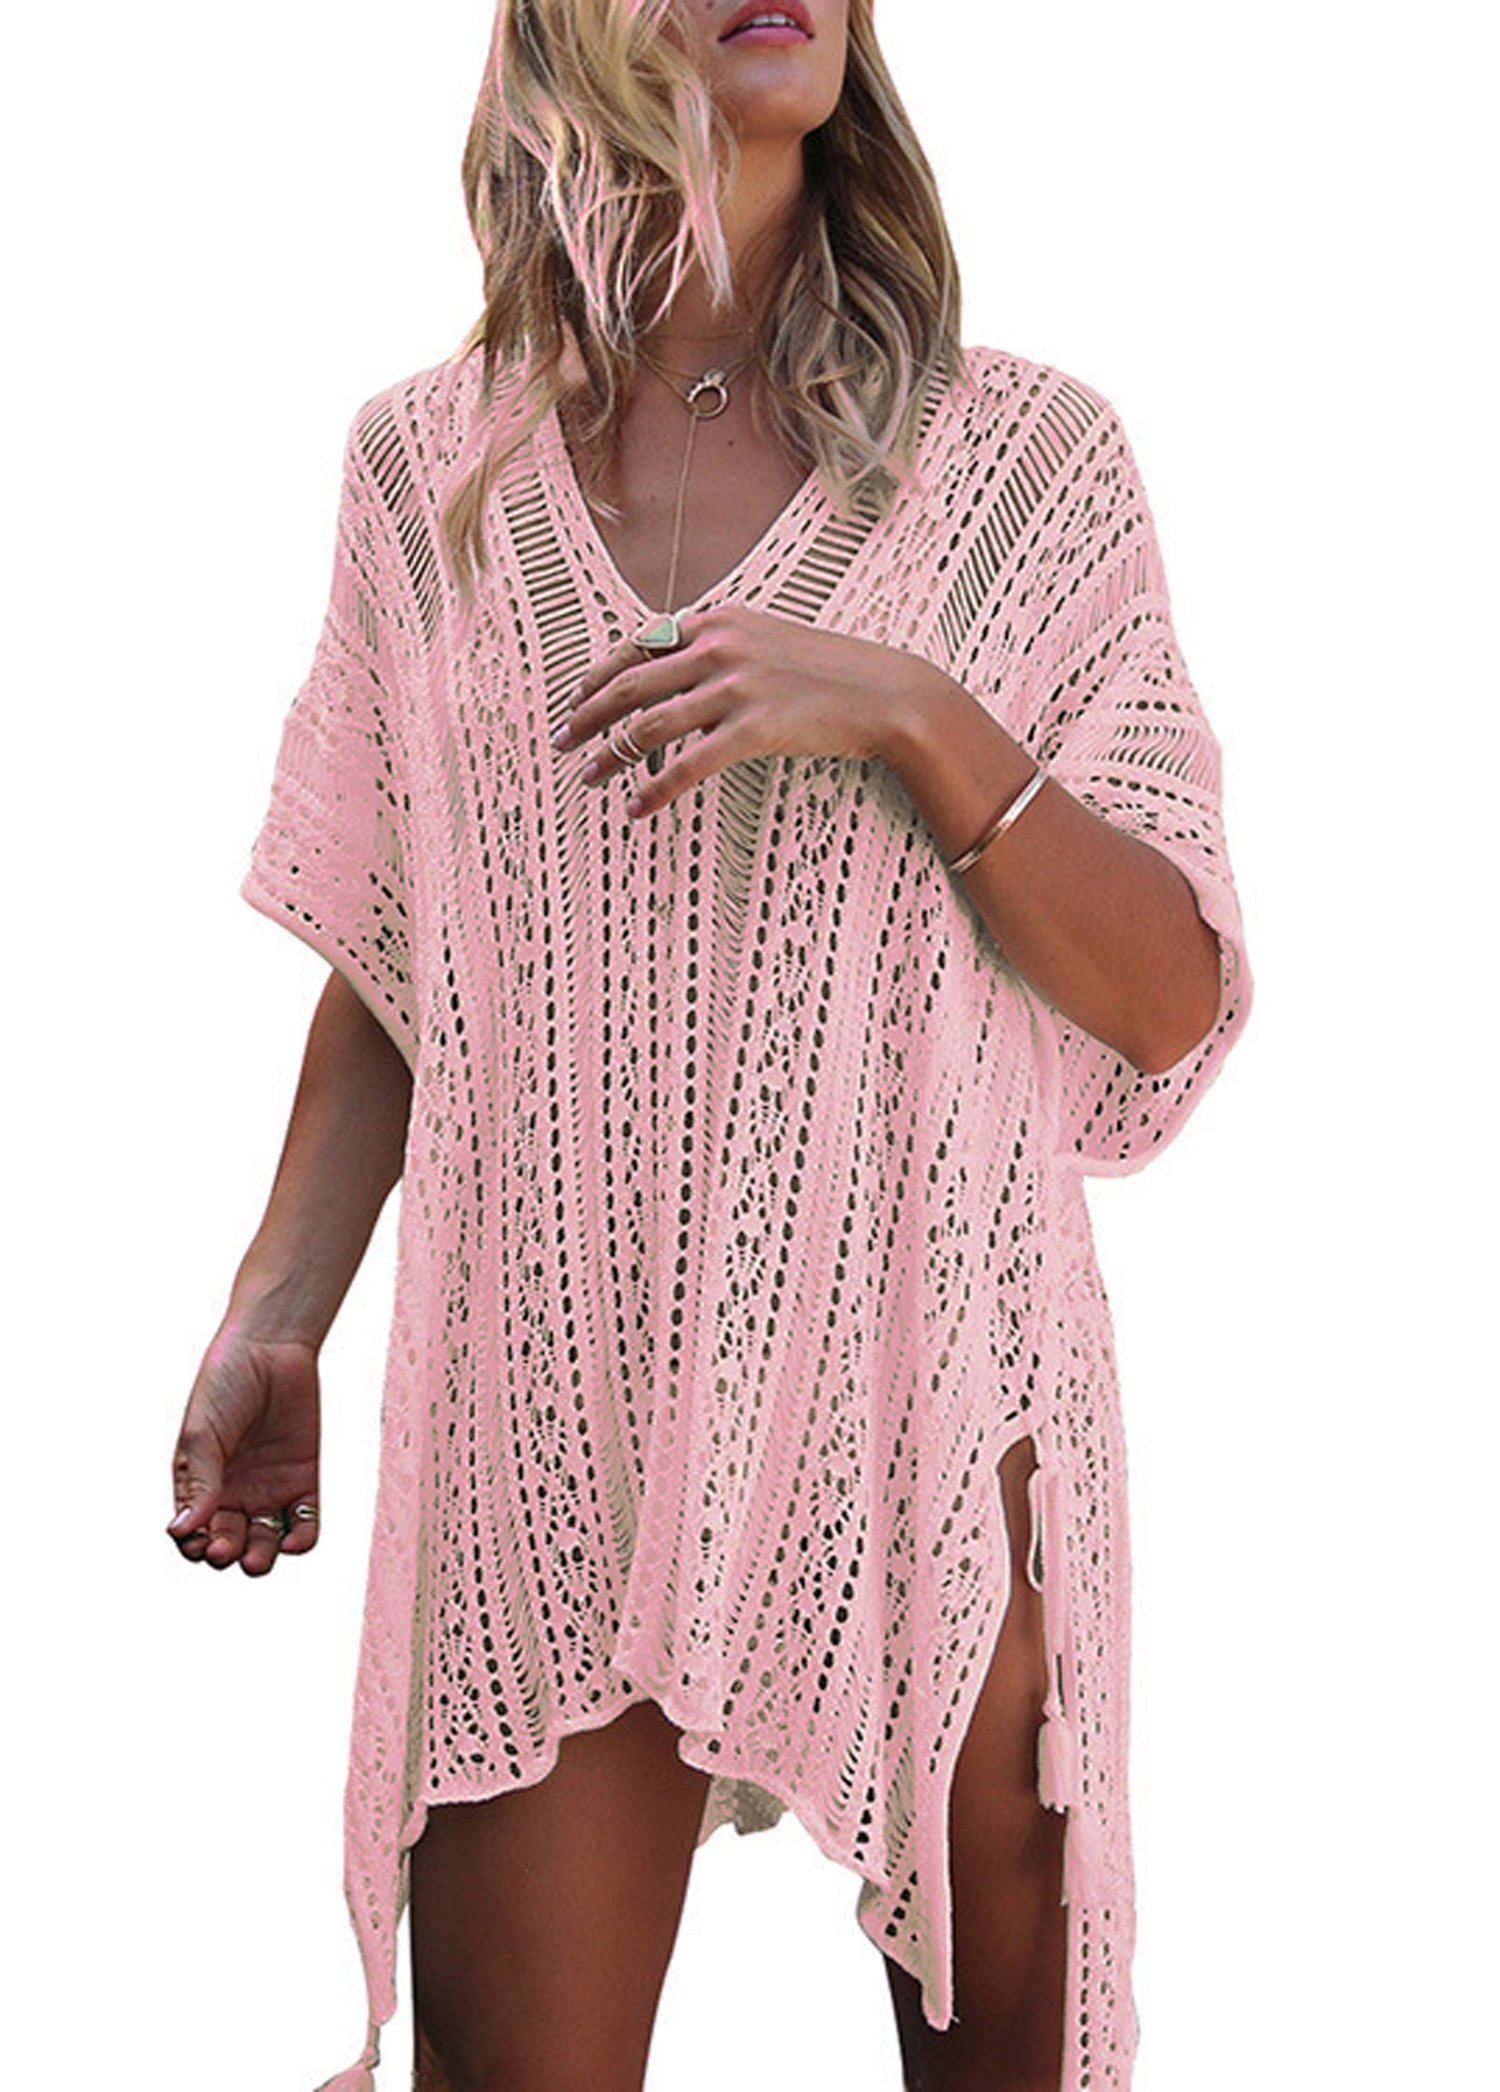 Wander Agio Beach Swimsuit For Women Sleeve Coverups Bikini Cover Up Slit Pink